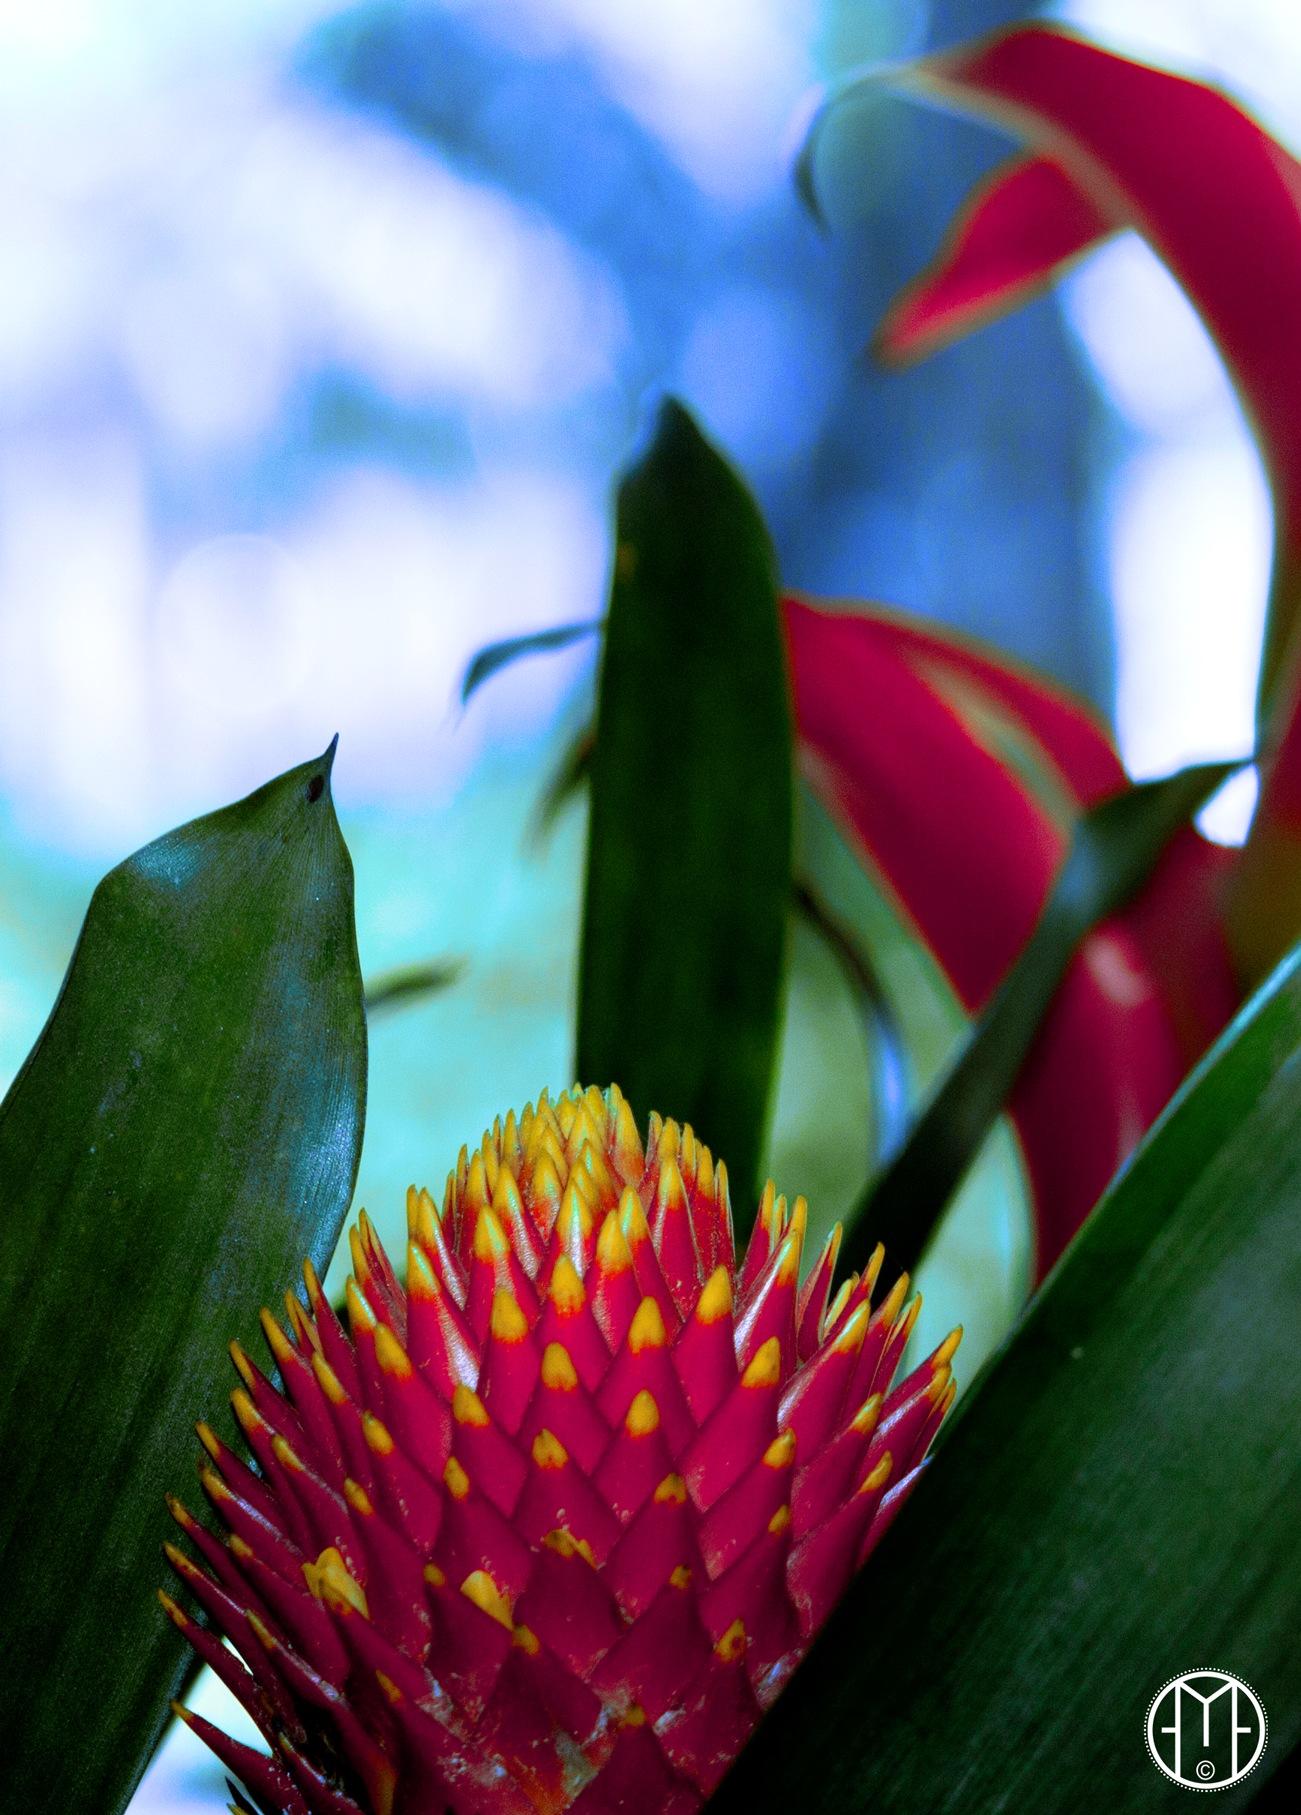 Tropical Flower - Flor Tropical by Gabriel Ochoa Rojas